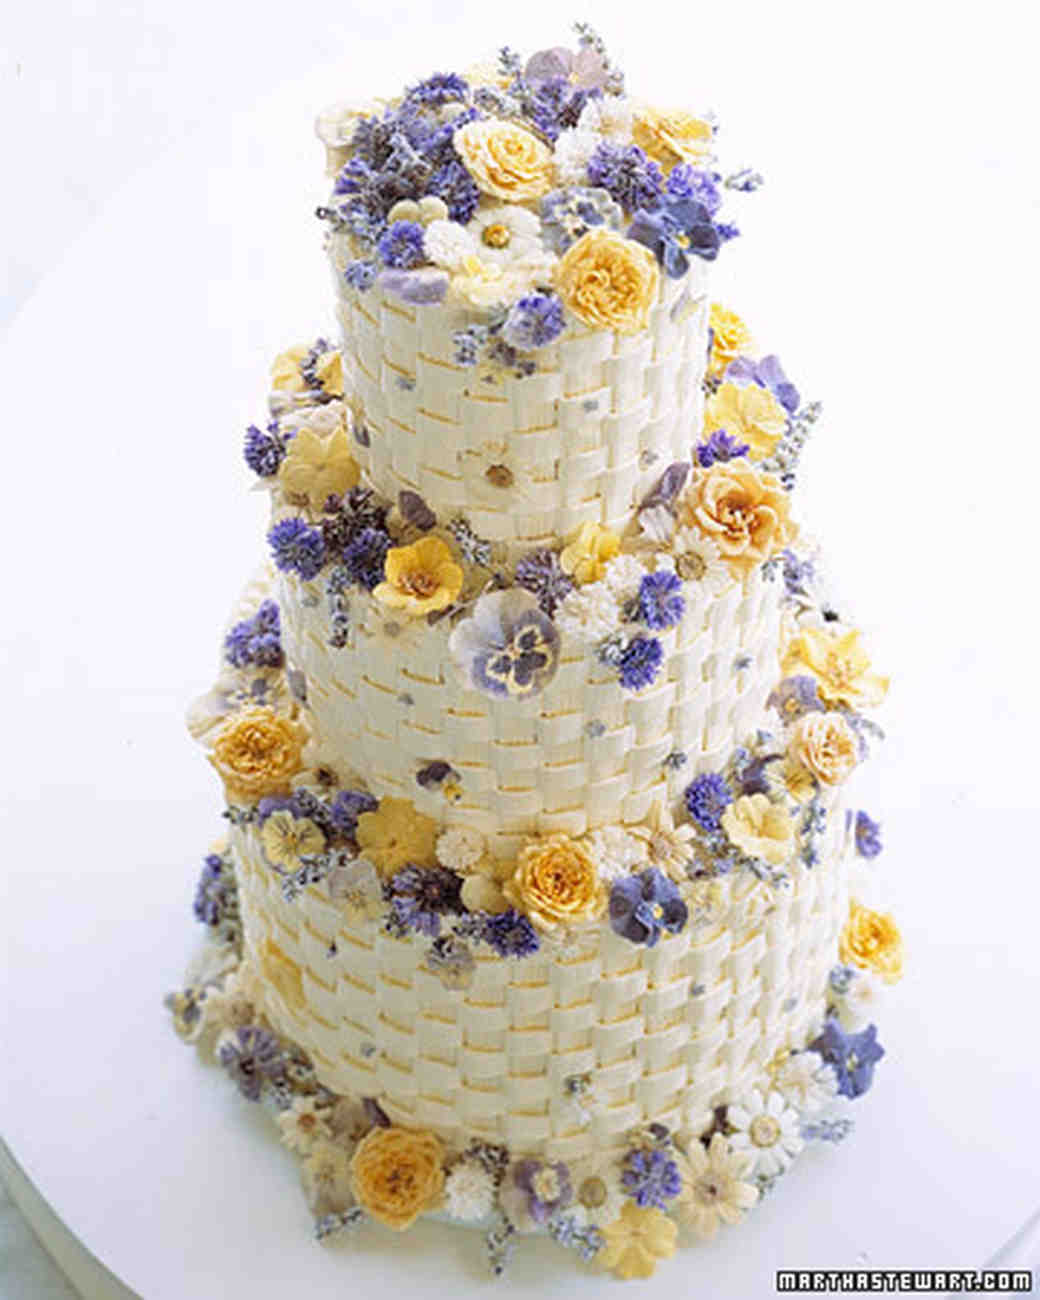 & Crystallized Flowers Cake